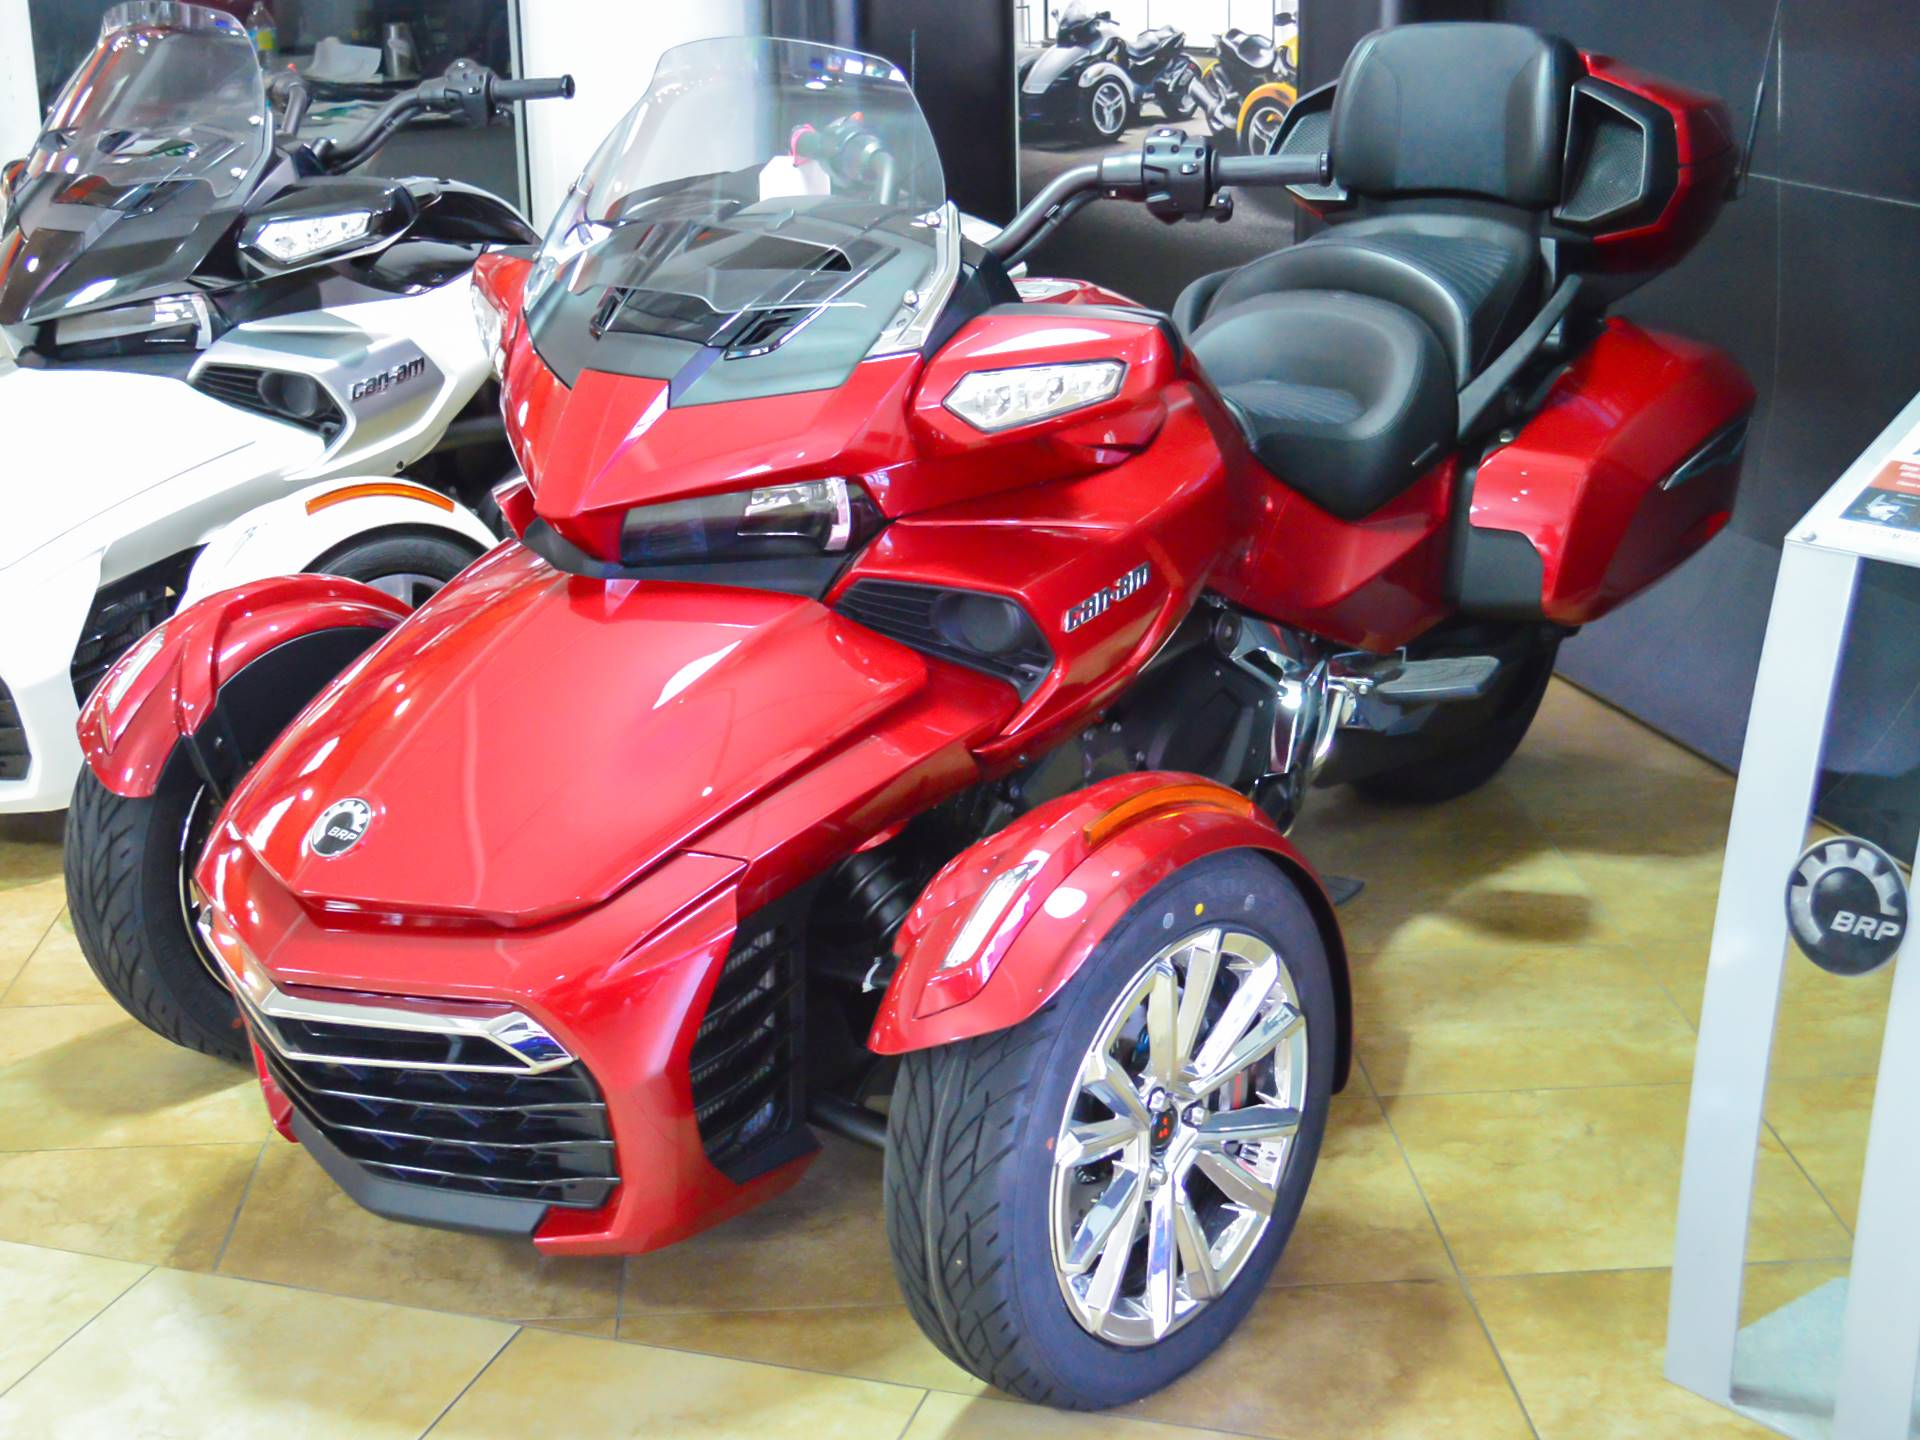 CanAm Spyder F Limited Motorcycles Pompano Beach Florida - Pompano car show